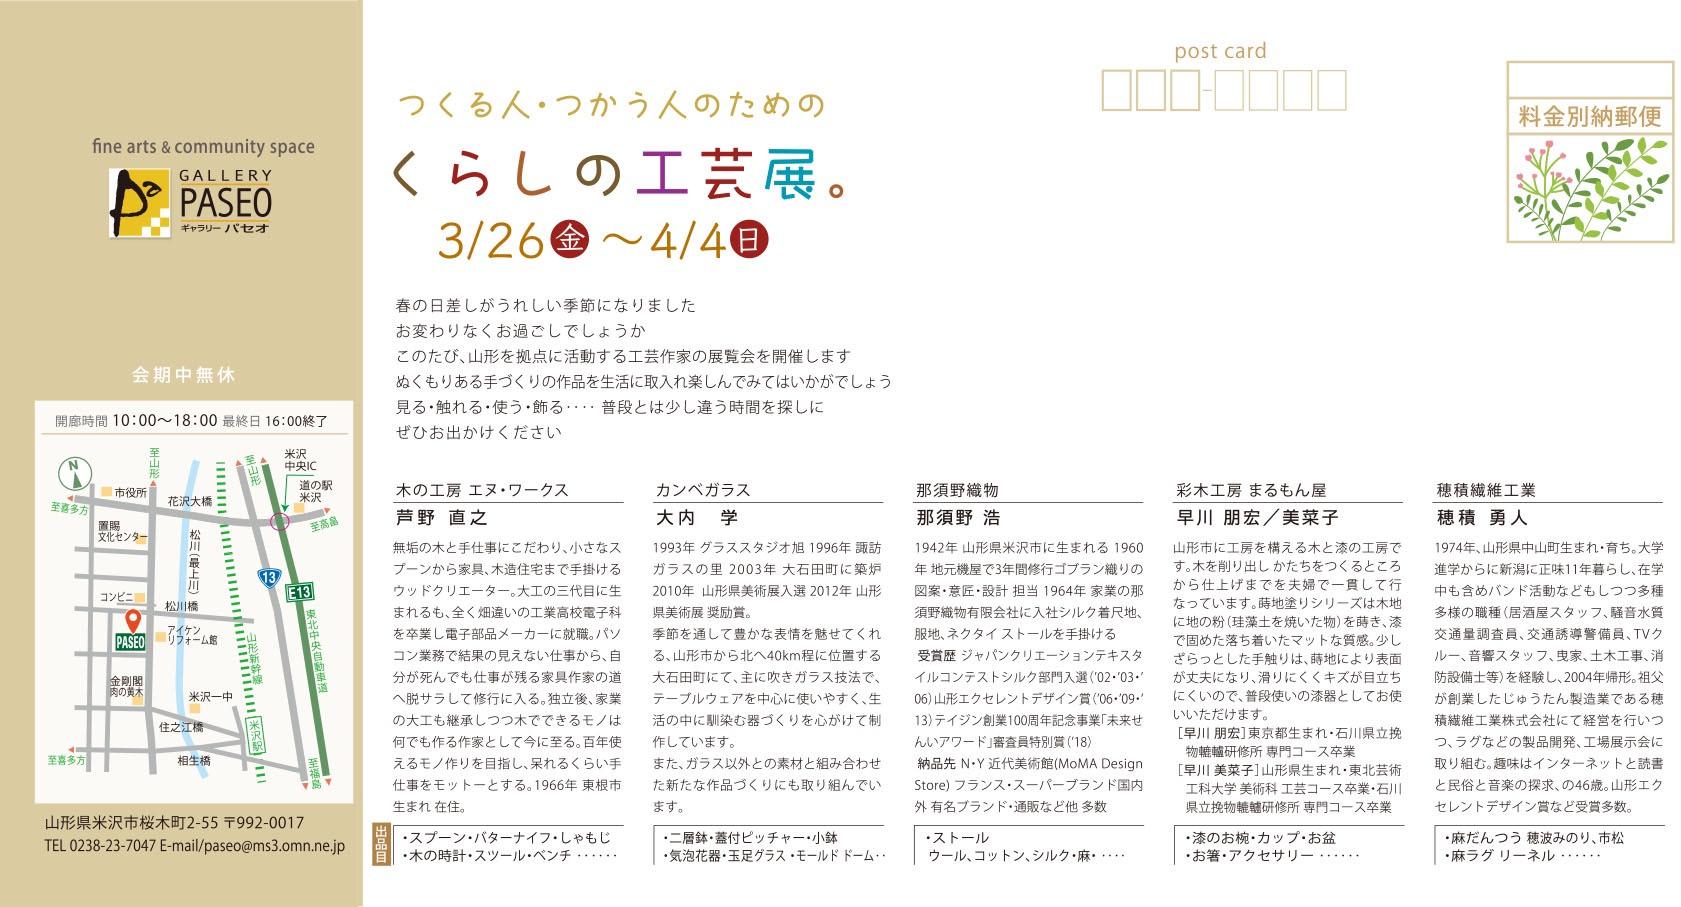 http://hozumi-rug.com/news/2021/S__182124551.jpg